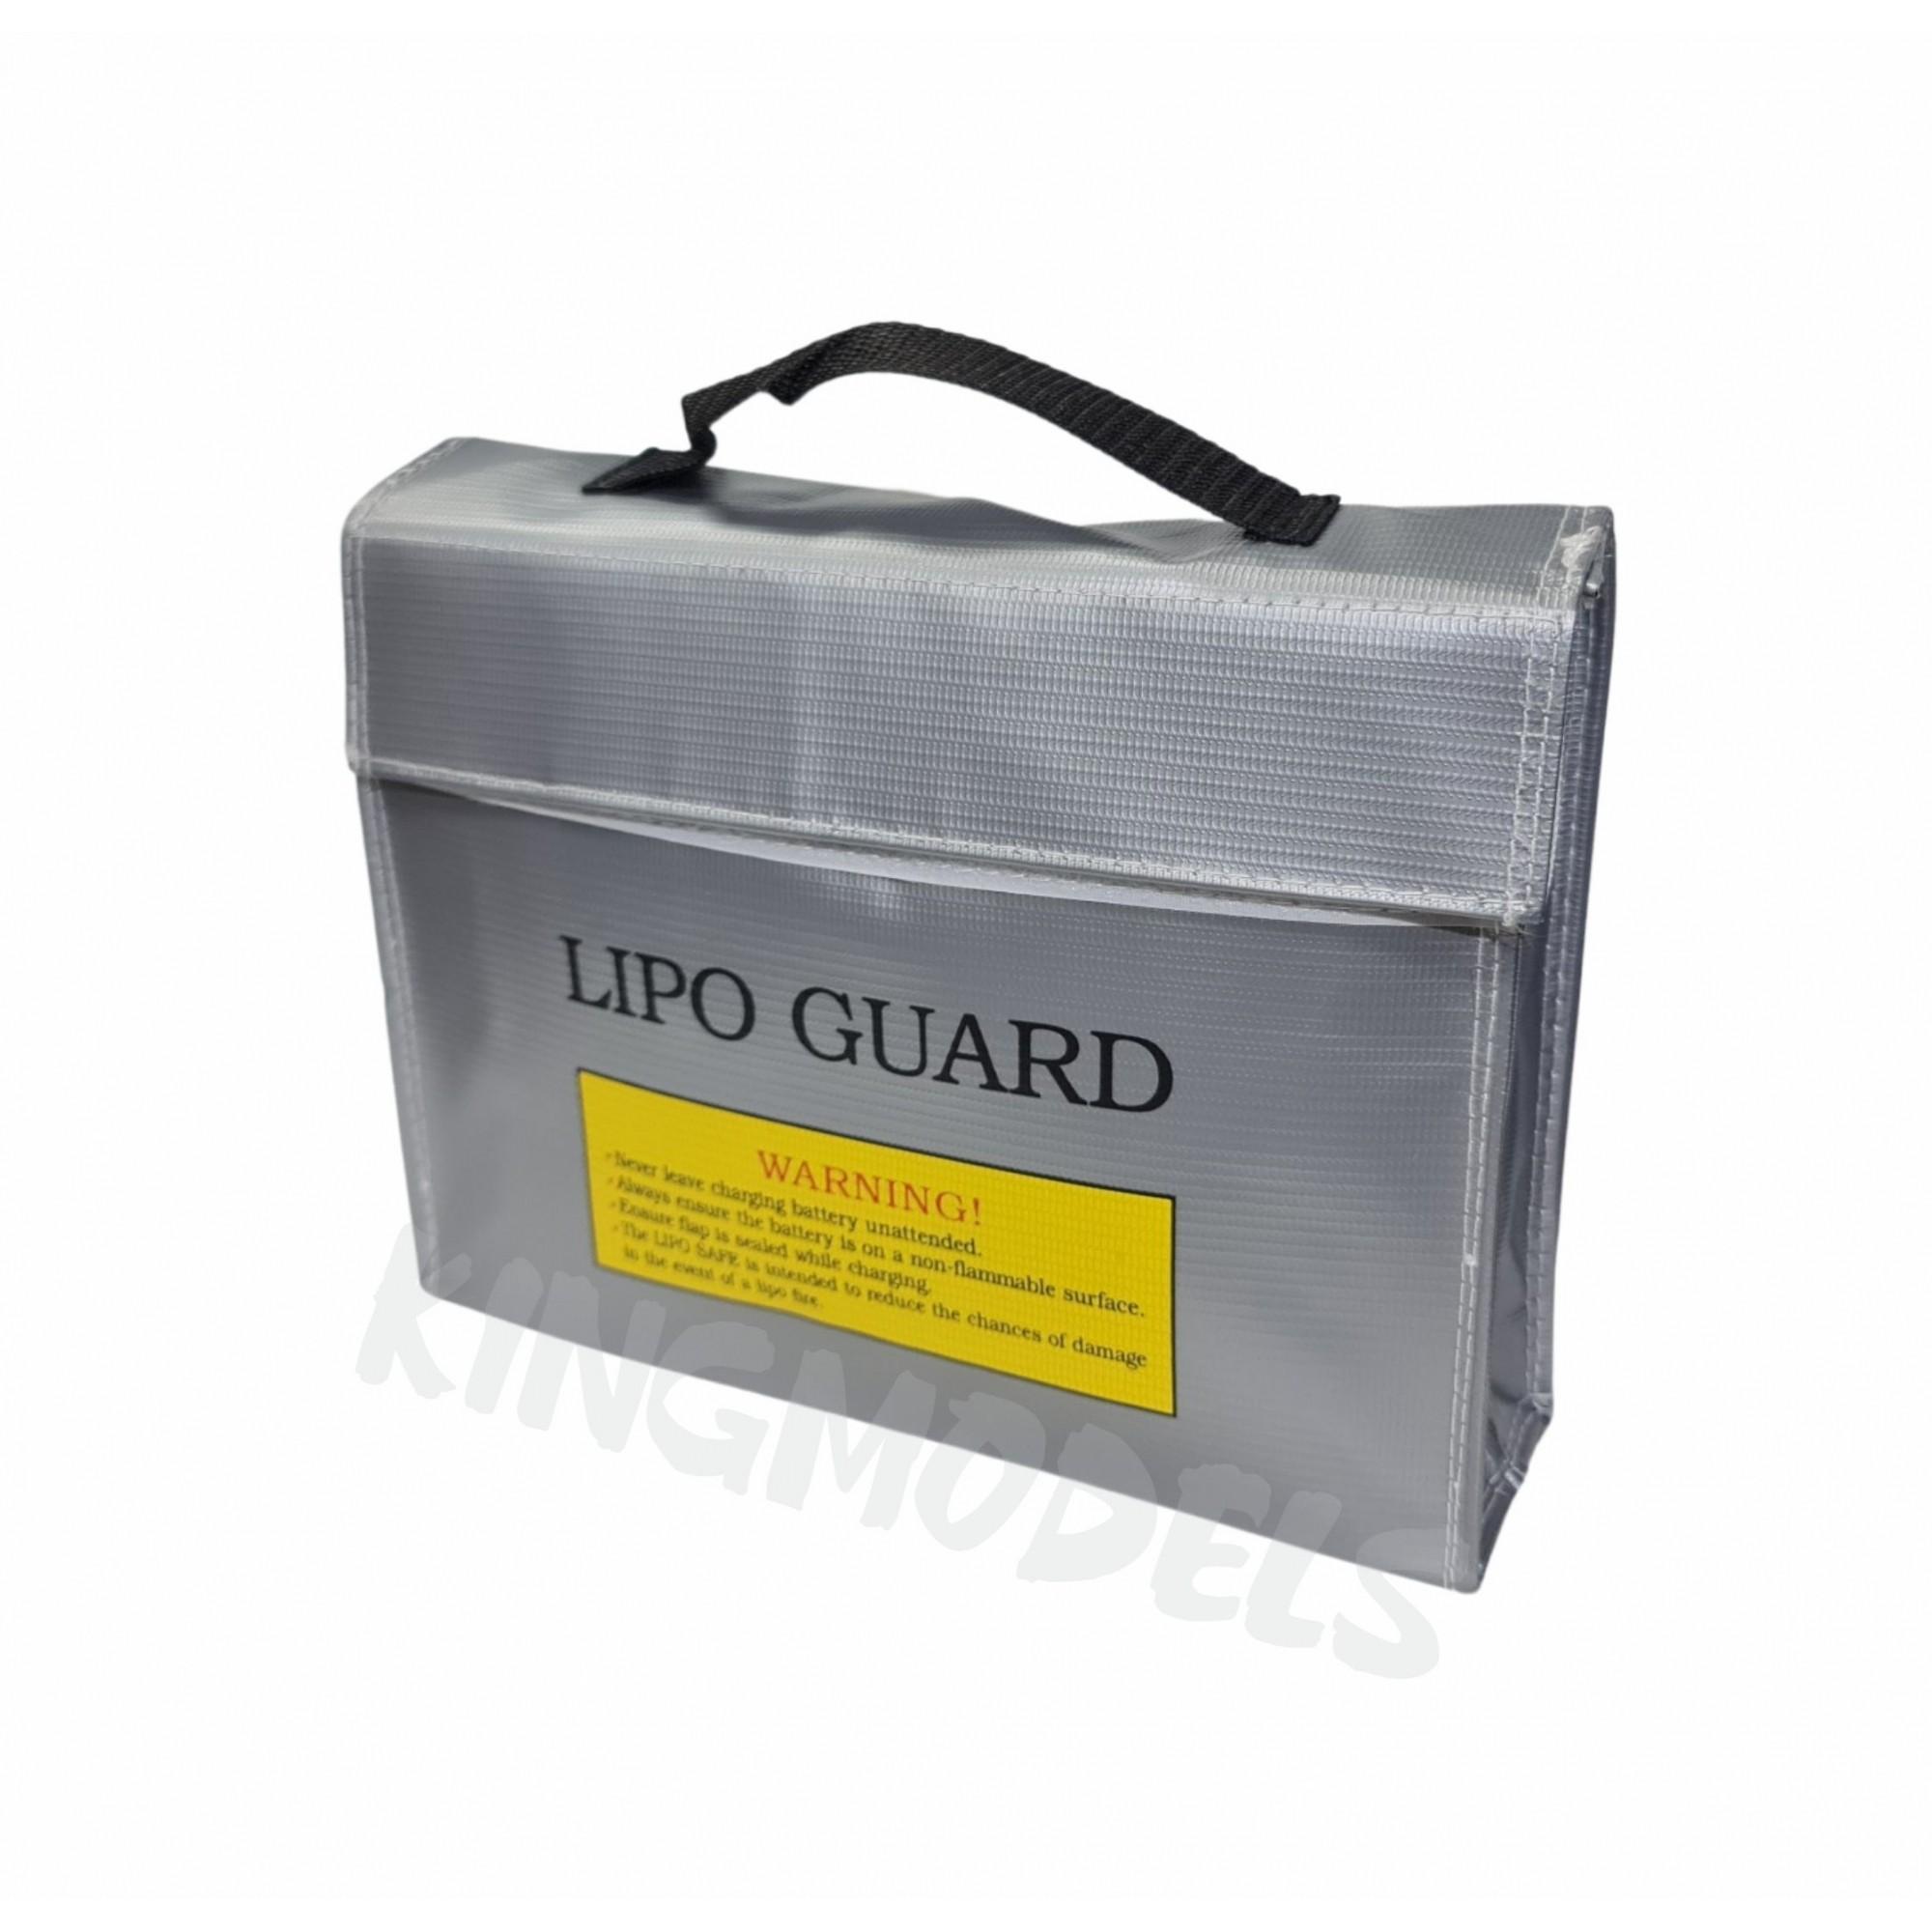 Lipo Bag Anti-chamas Para Baterias Lipo - 24 X 19 X 6 - Bolsa  - King Models